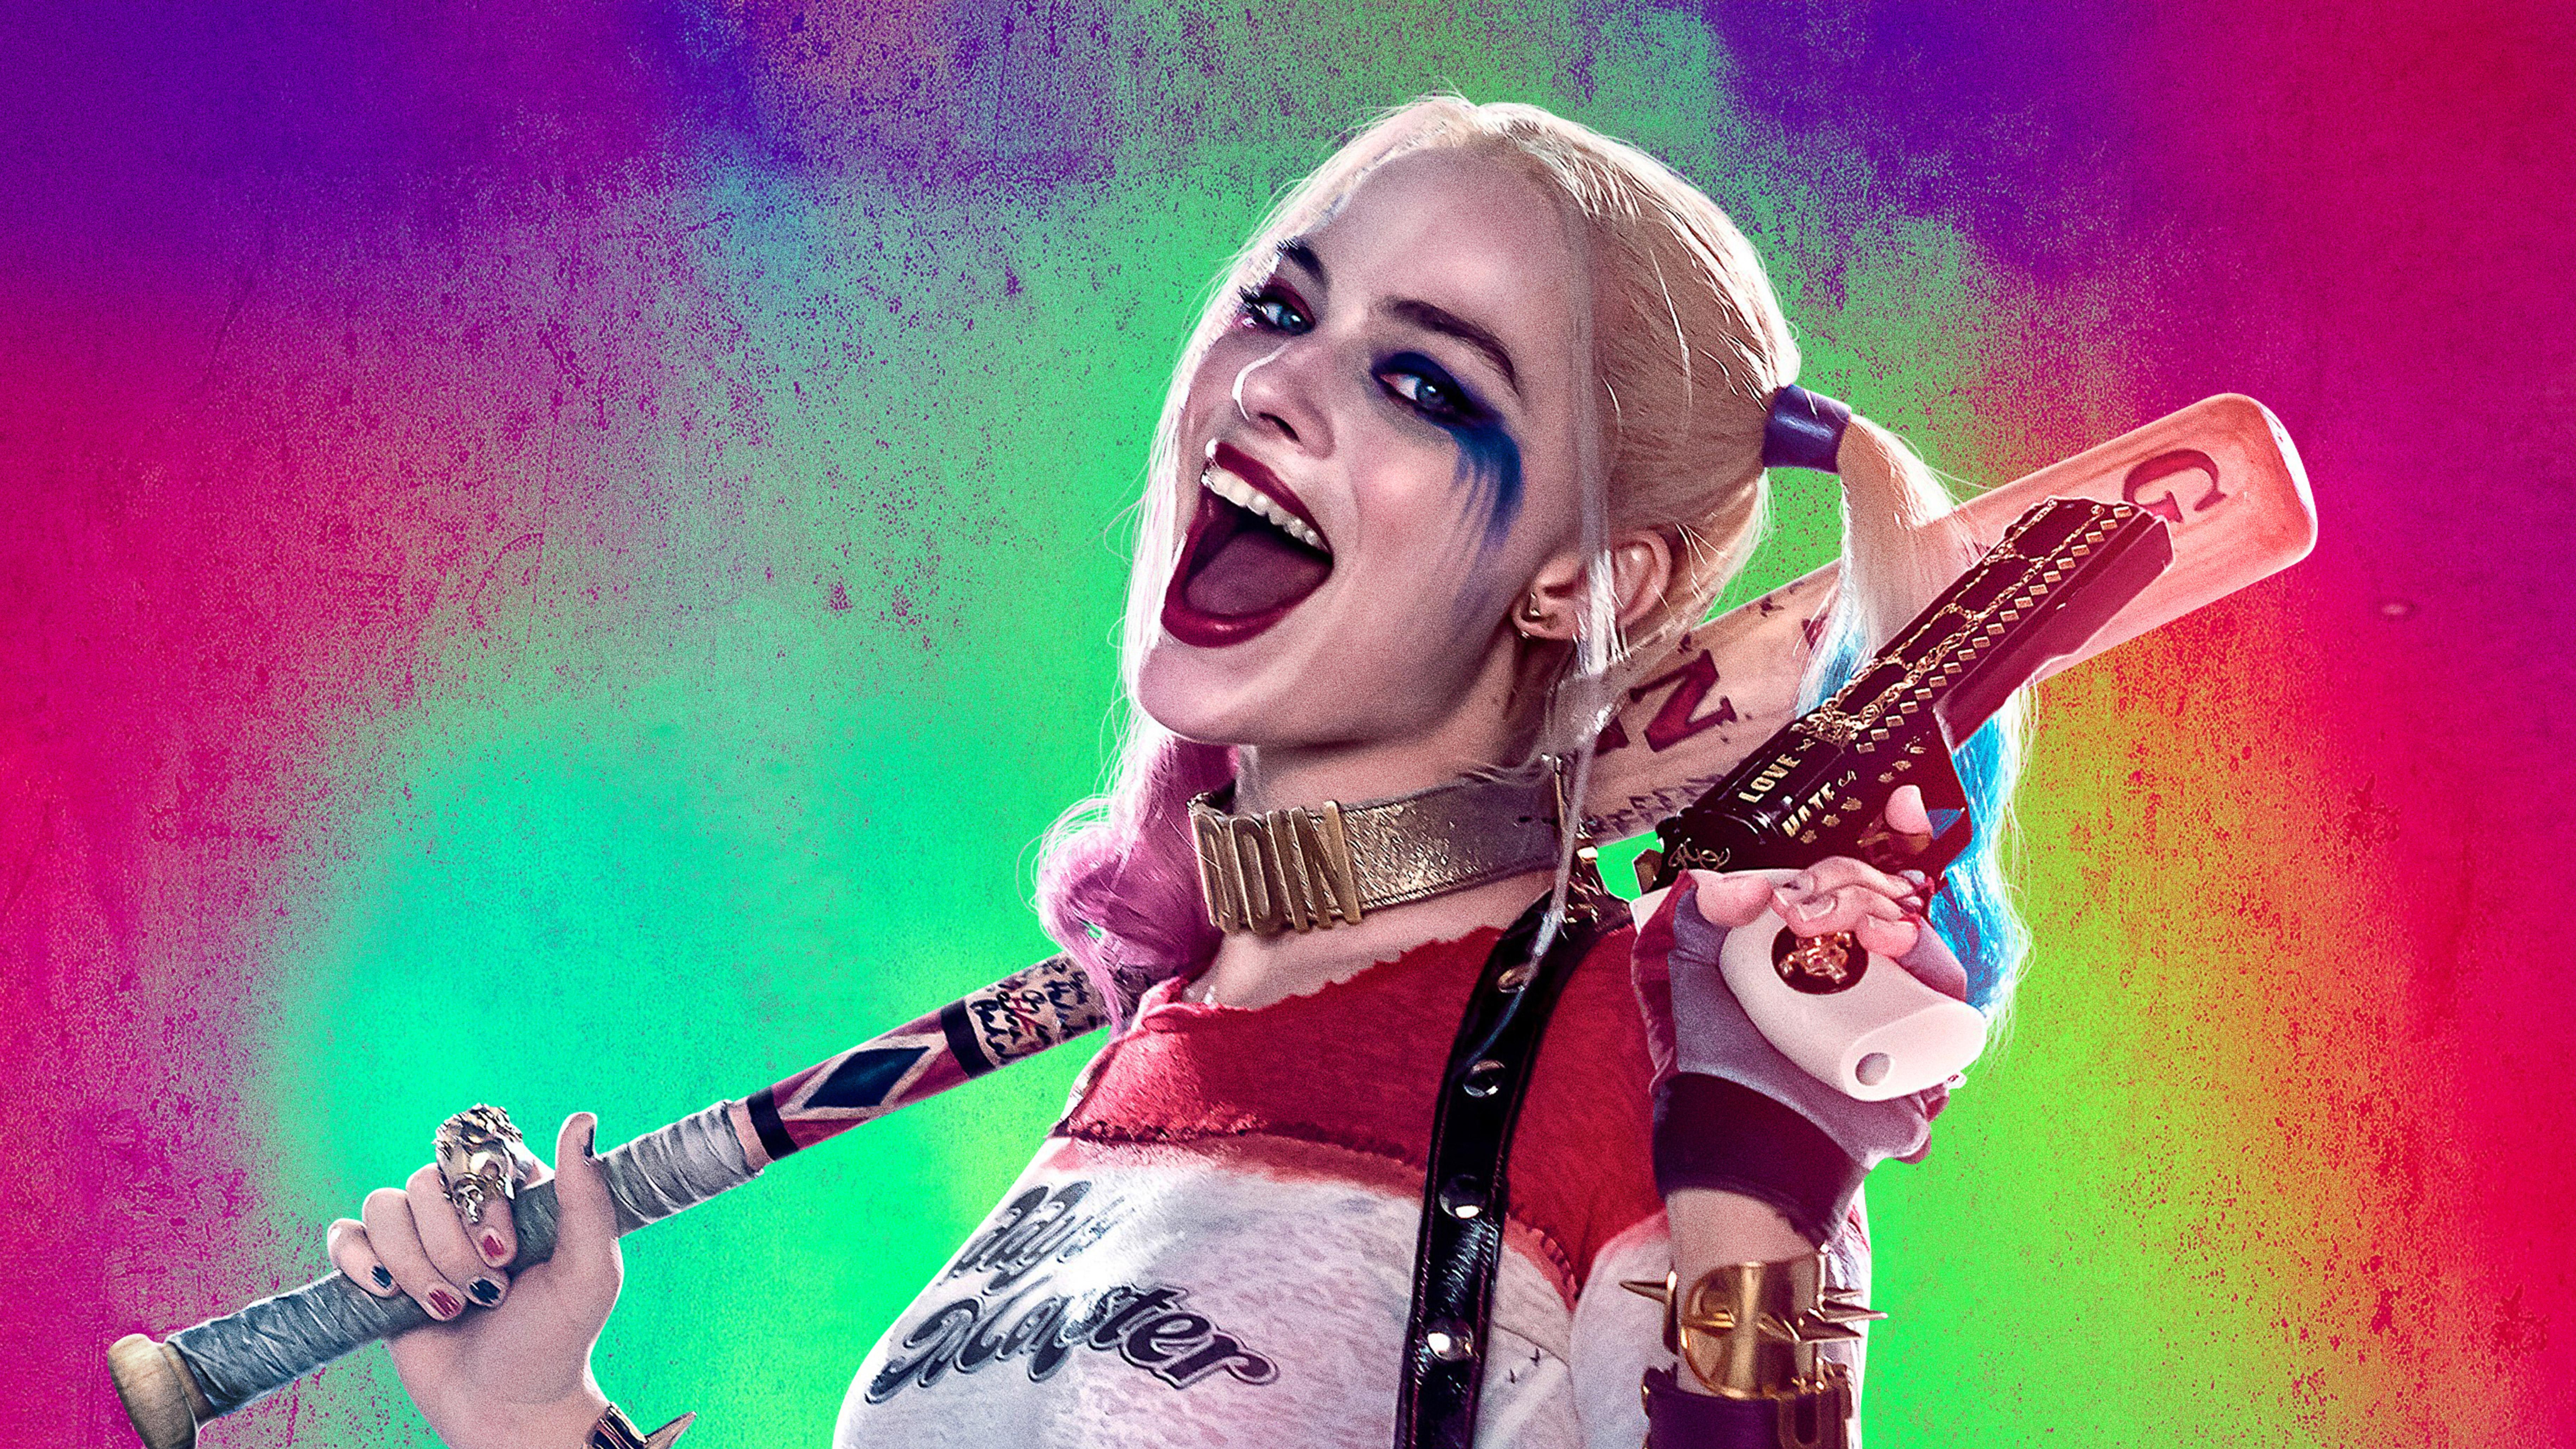 Harley Quinn 8k, HD Movies, 4k Wallpapers, Images